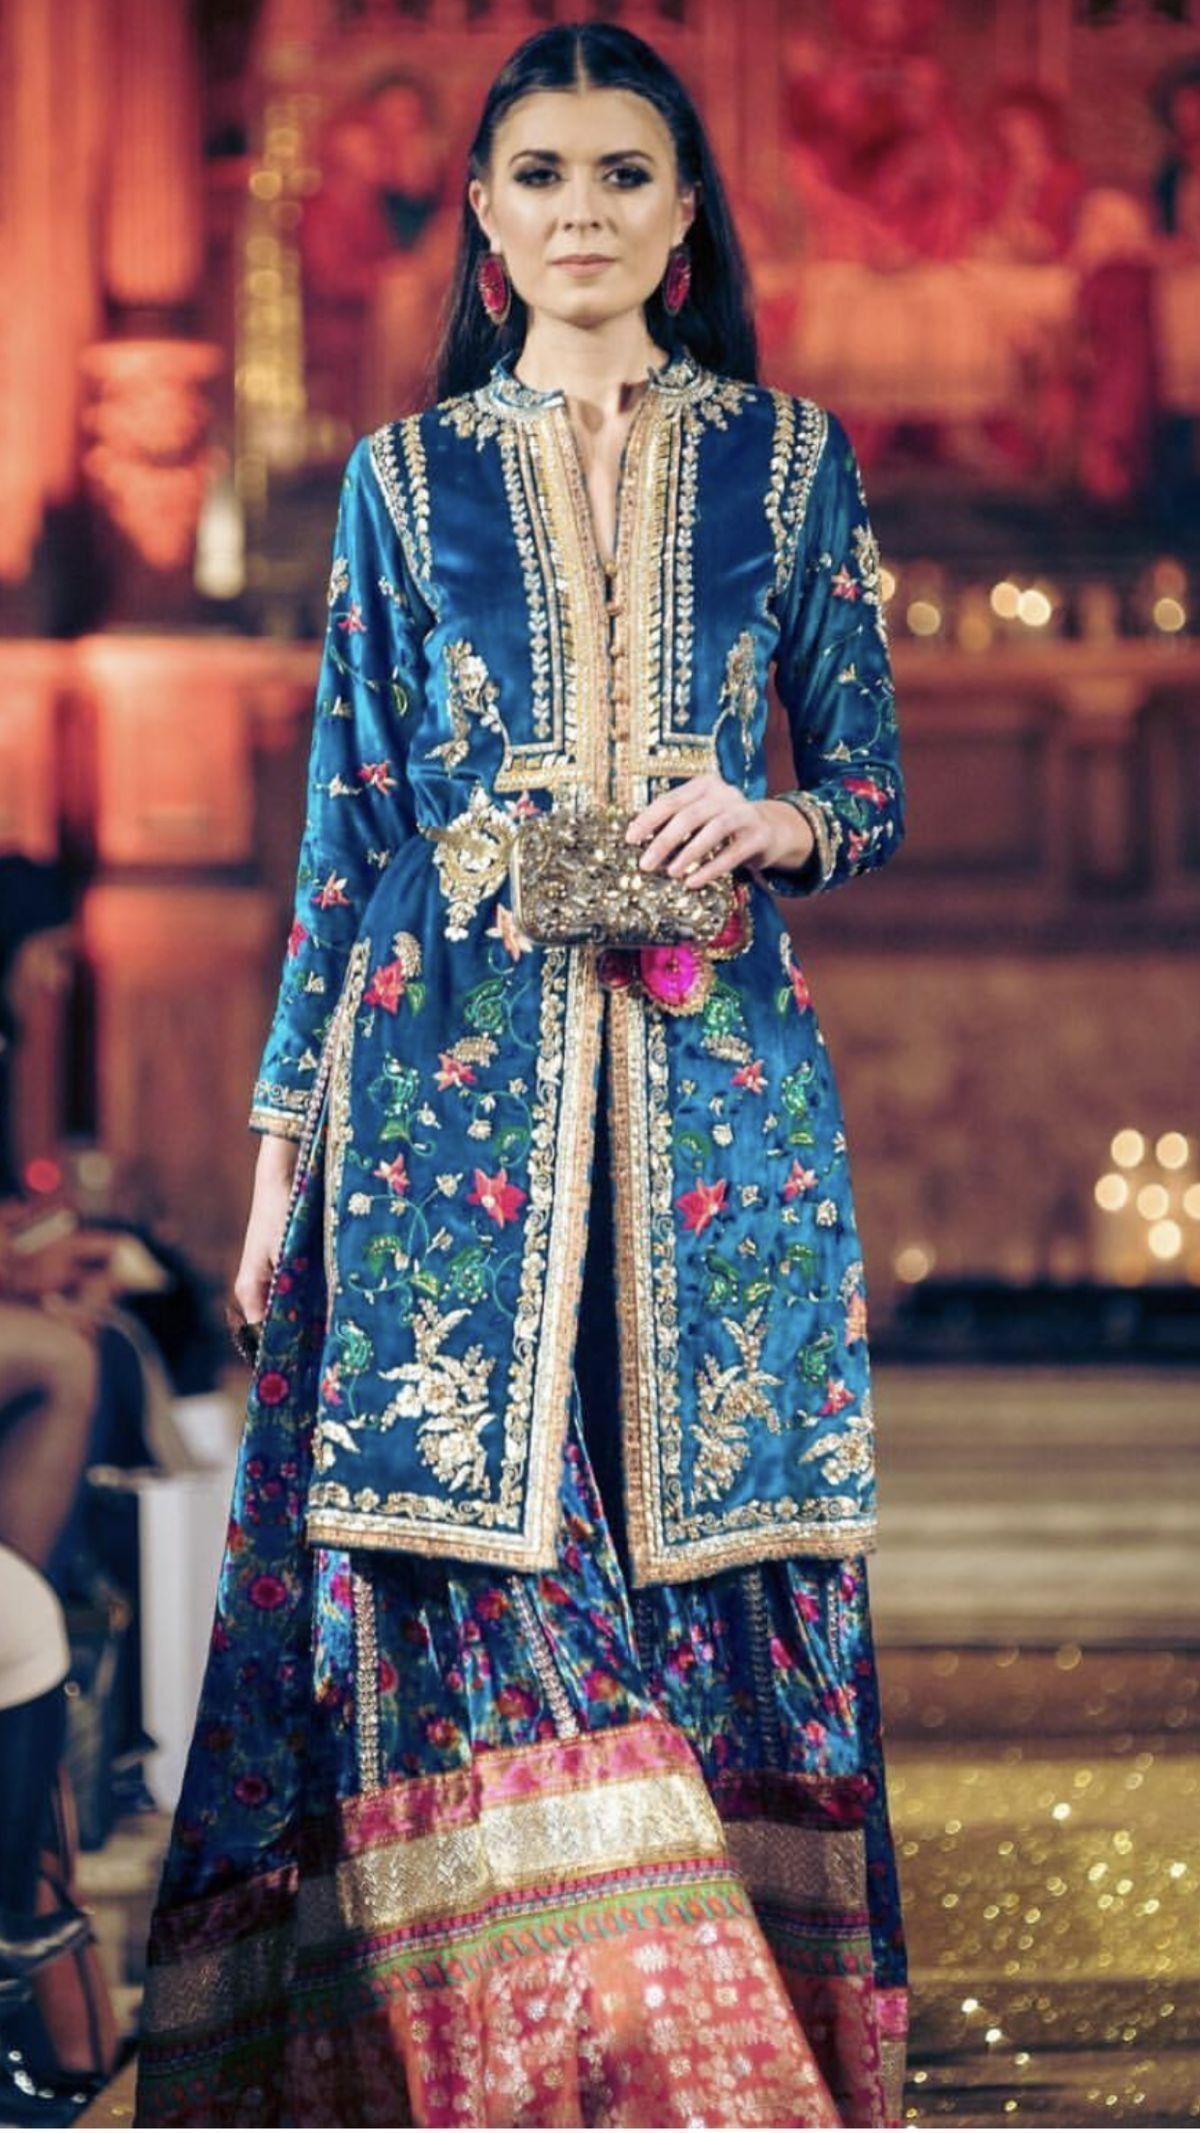 Pin by Suman Zulfiqar on Bridal & Party Wears | Pinterest ...